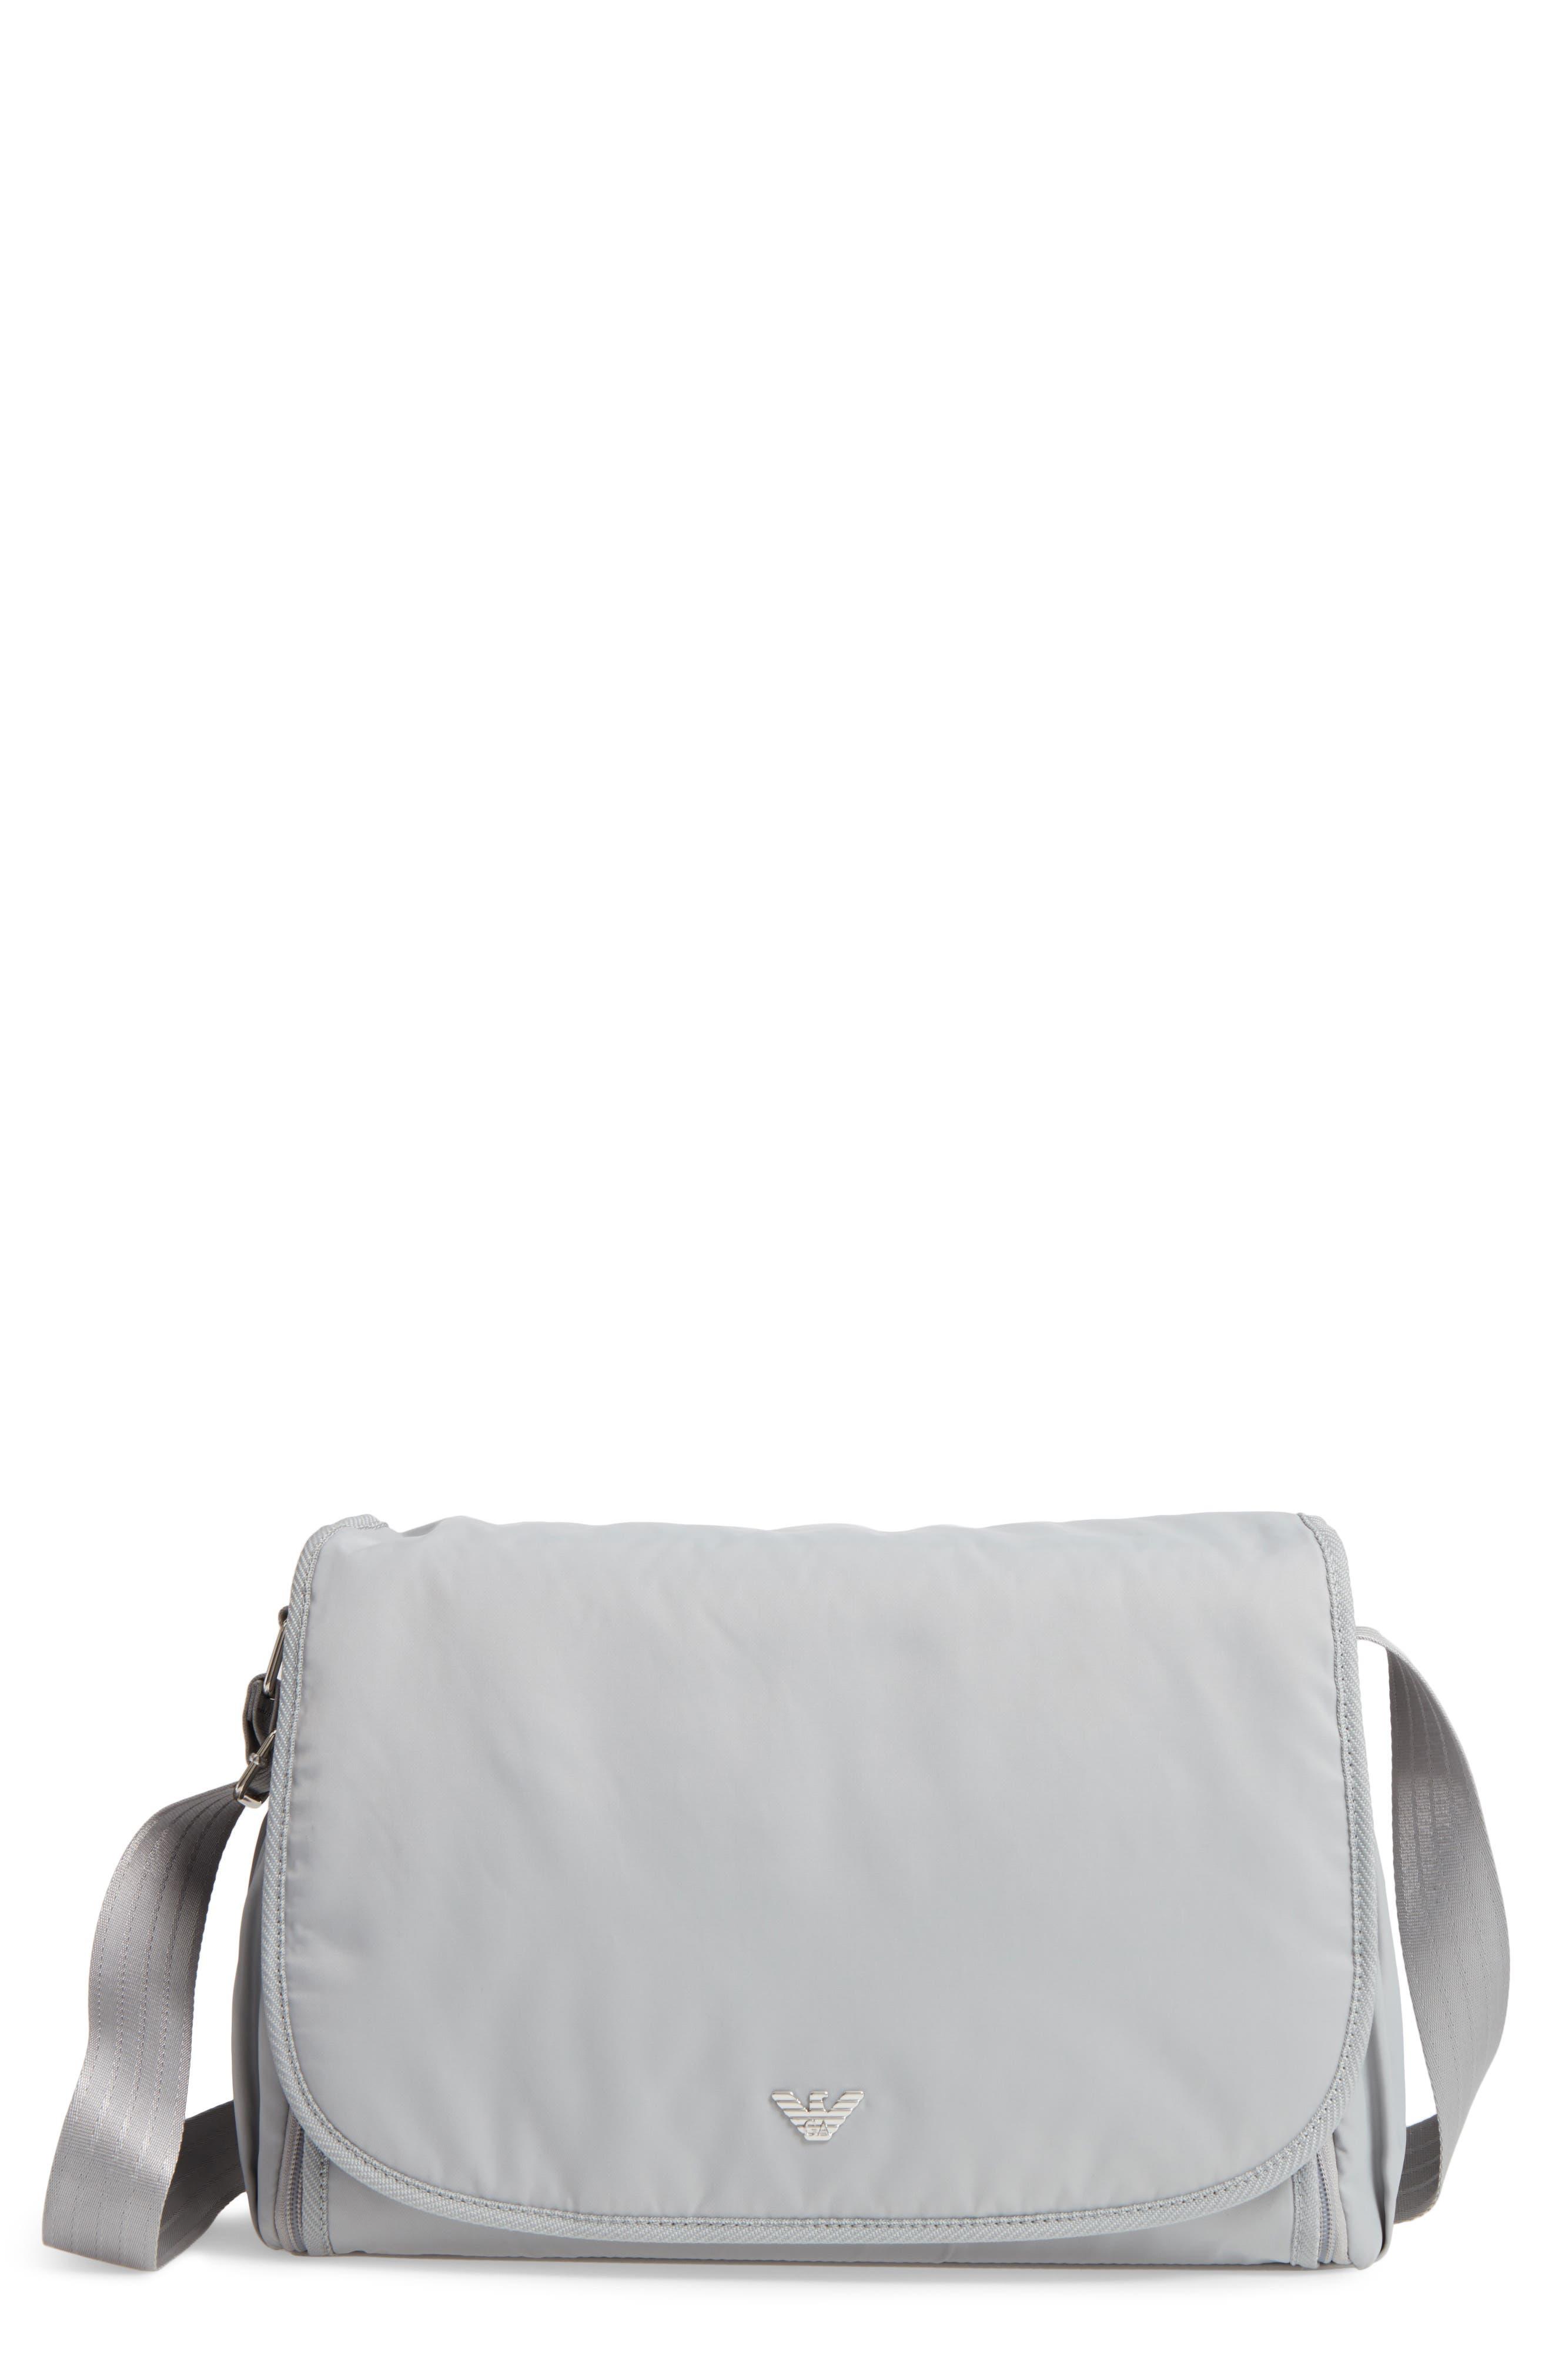 Nylon Messenger Diaper Bag,                         Main,                         color, 054